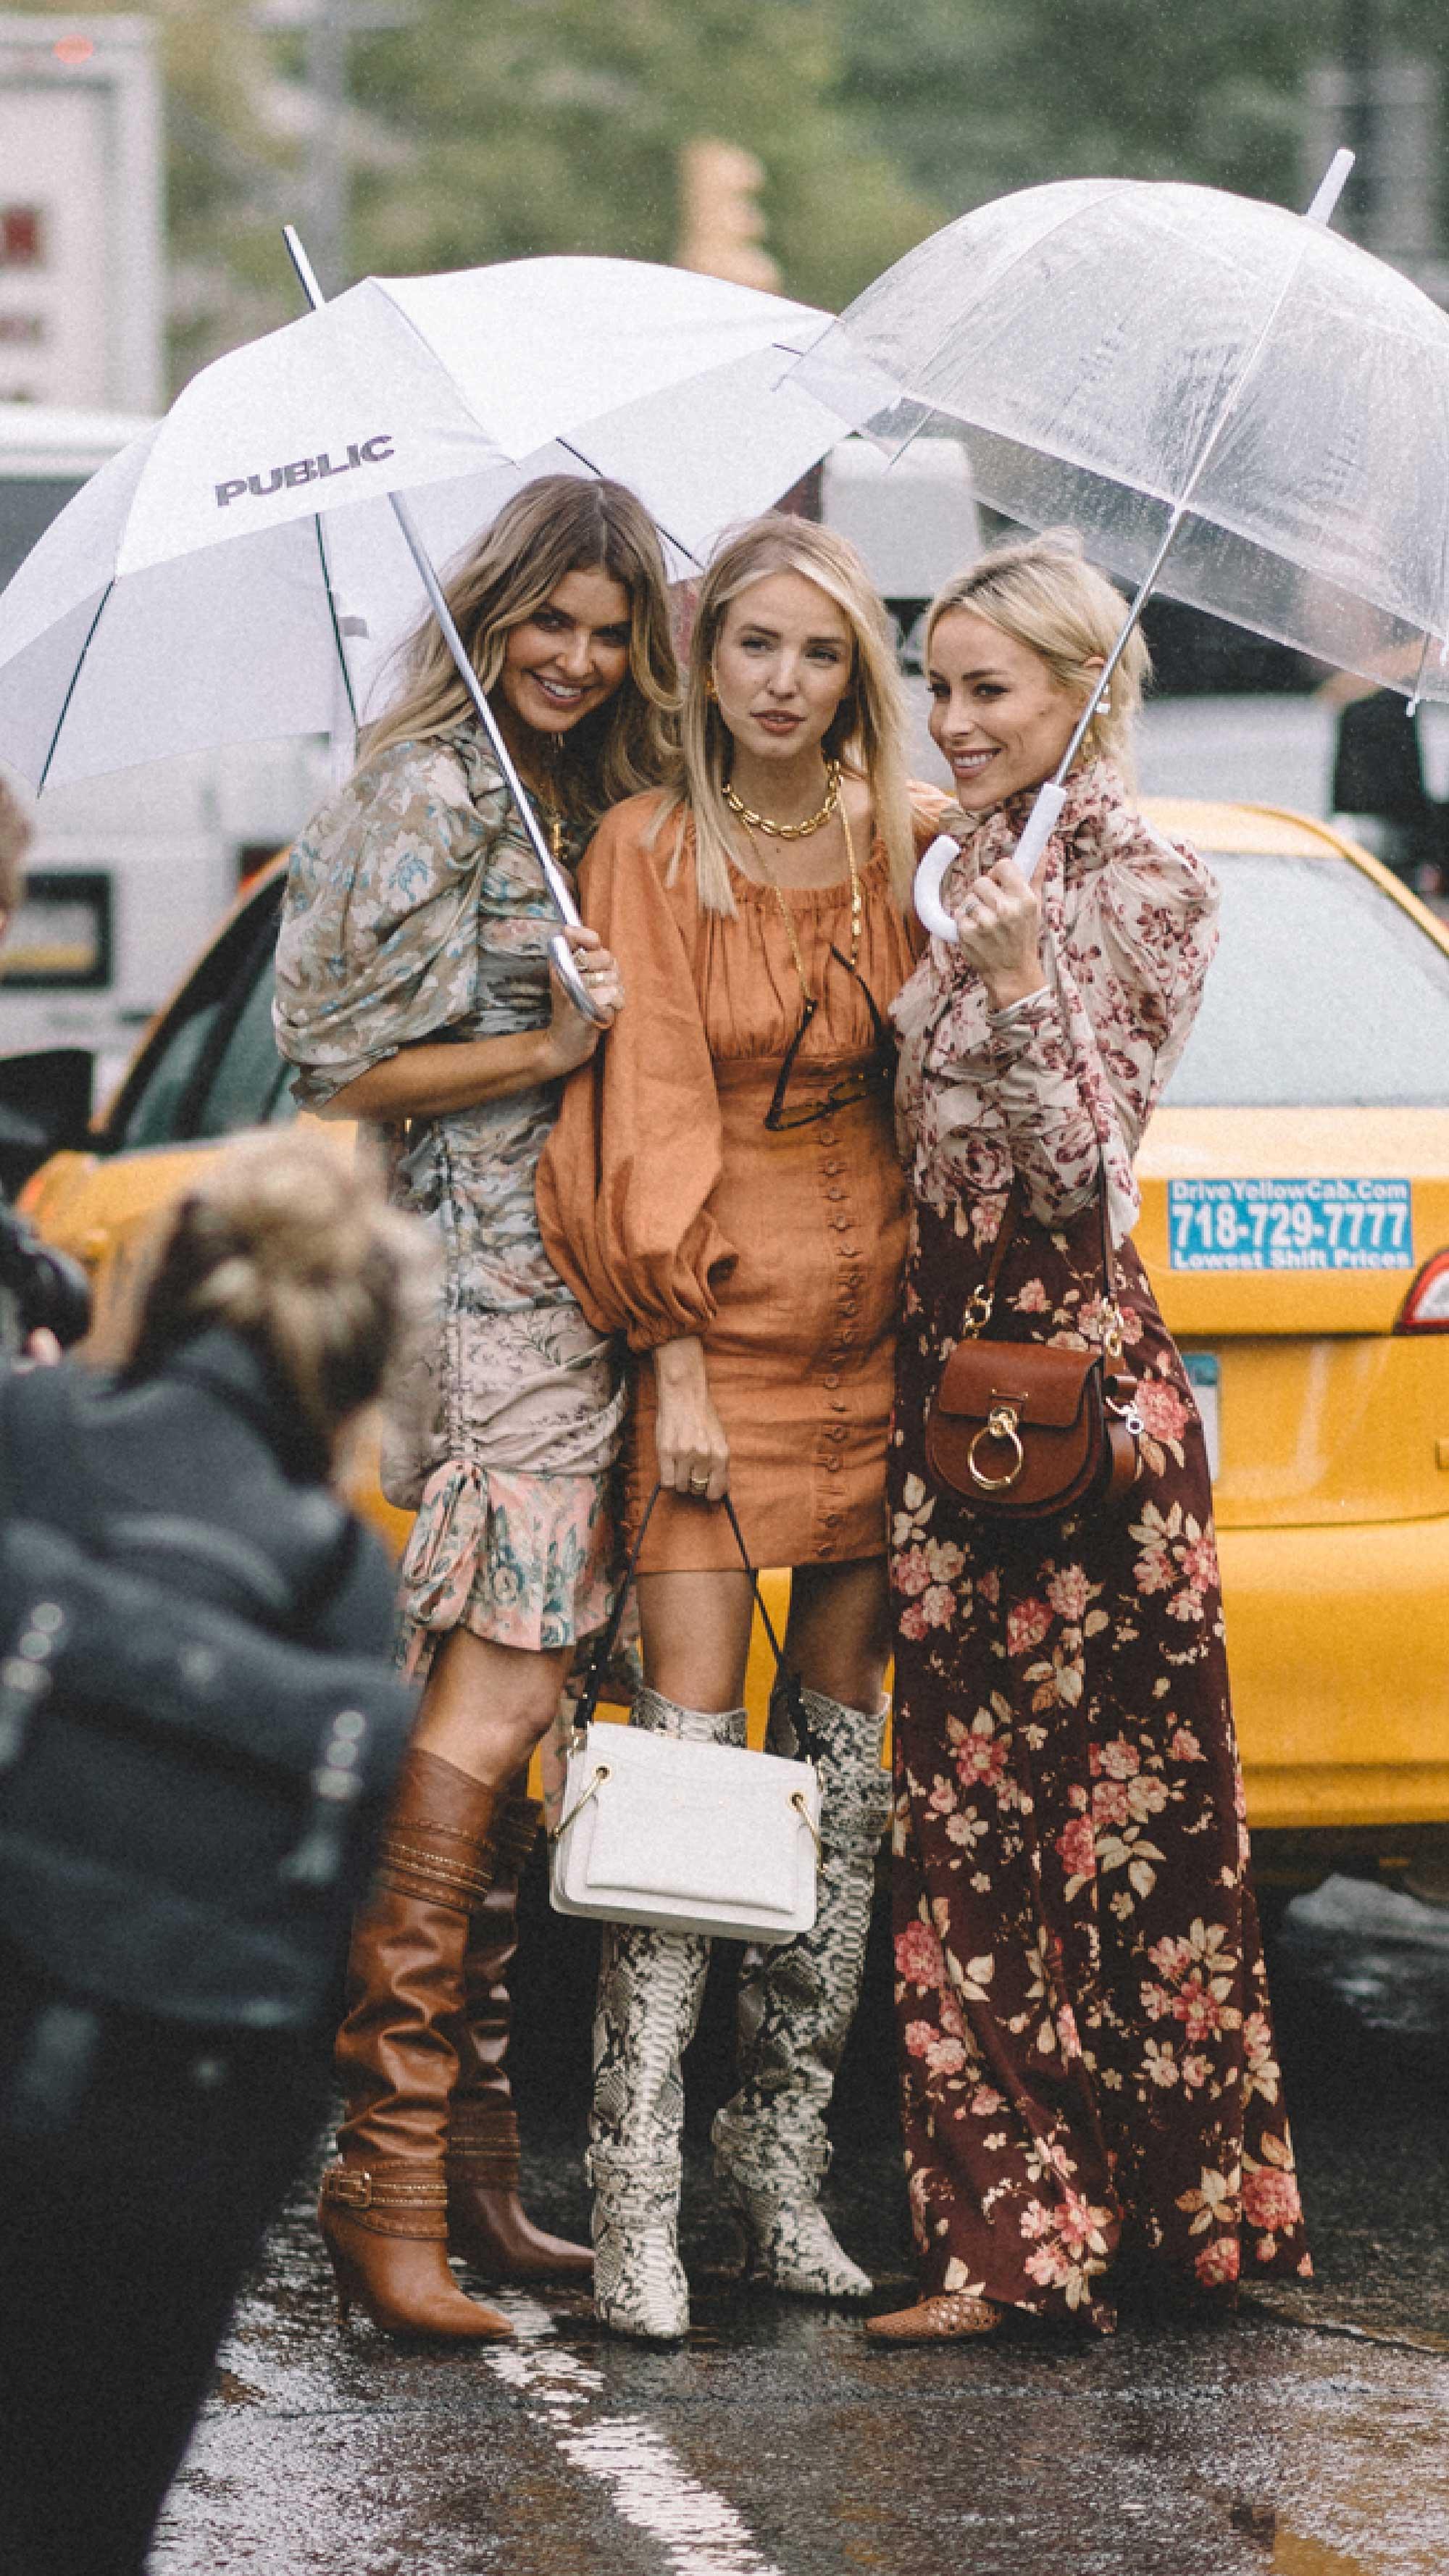 New-York-Fashion-Week-NYFW-SS18-street-style-day-five-SS1838.jpg